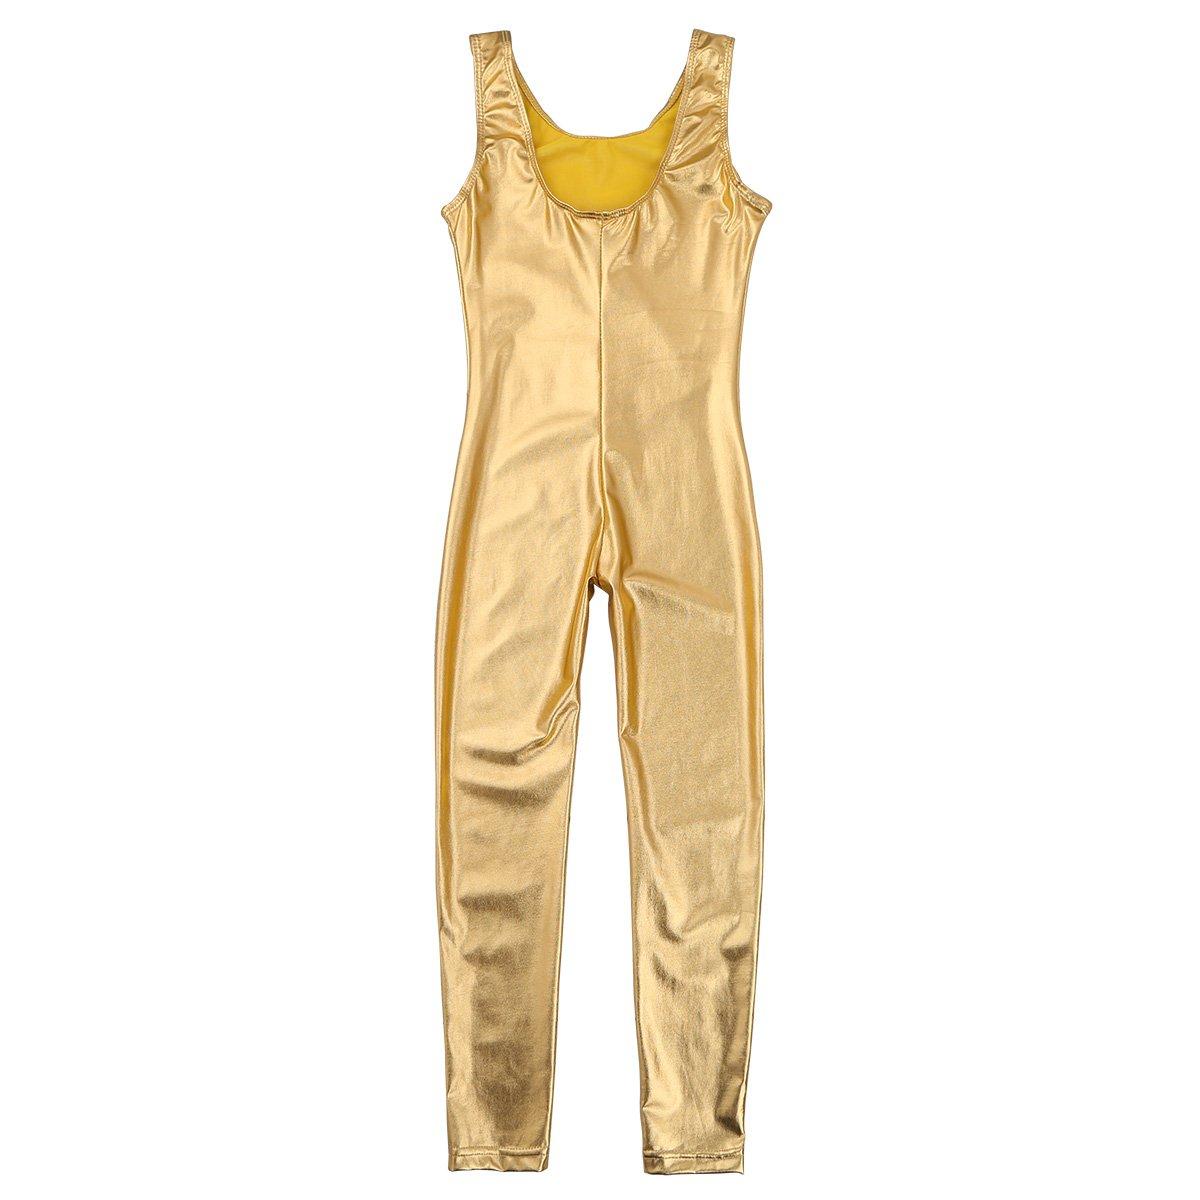 b8ca6ac23 Amazon.com  Alvivi Kid s Boys Girls Long Sleeve Unitard Jumpsuit ...